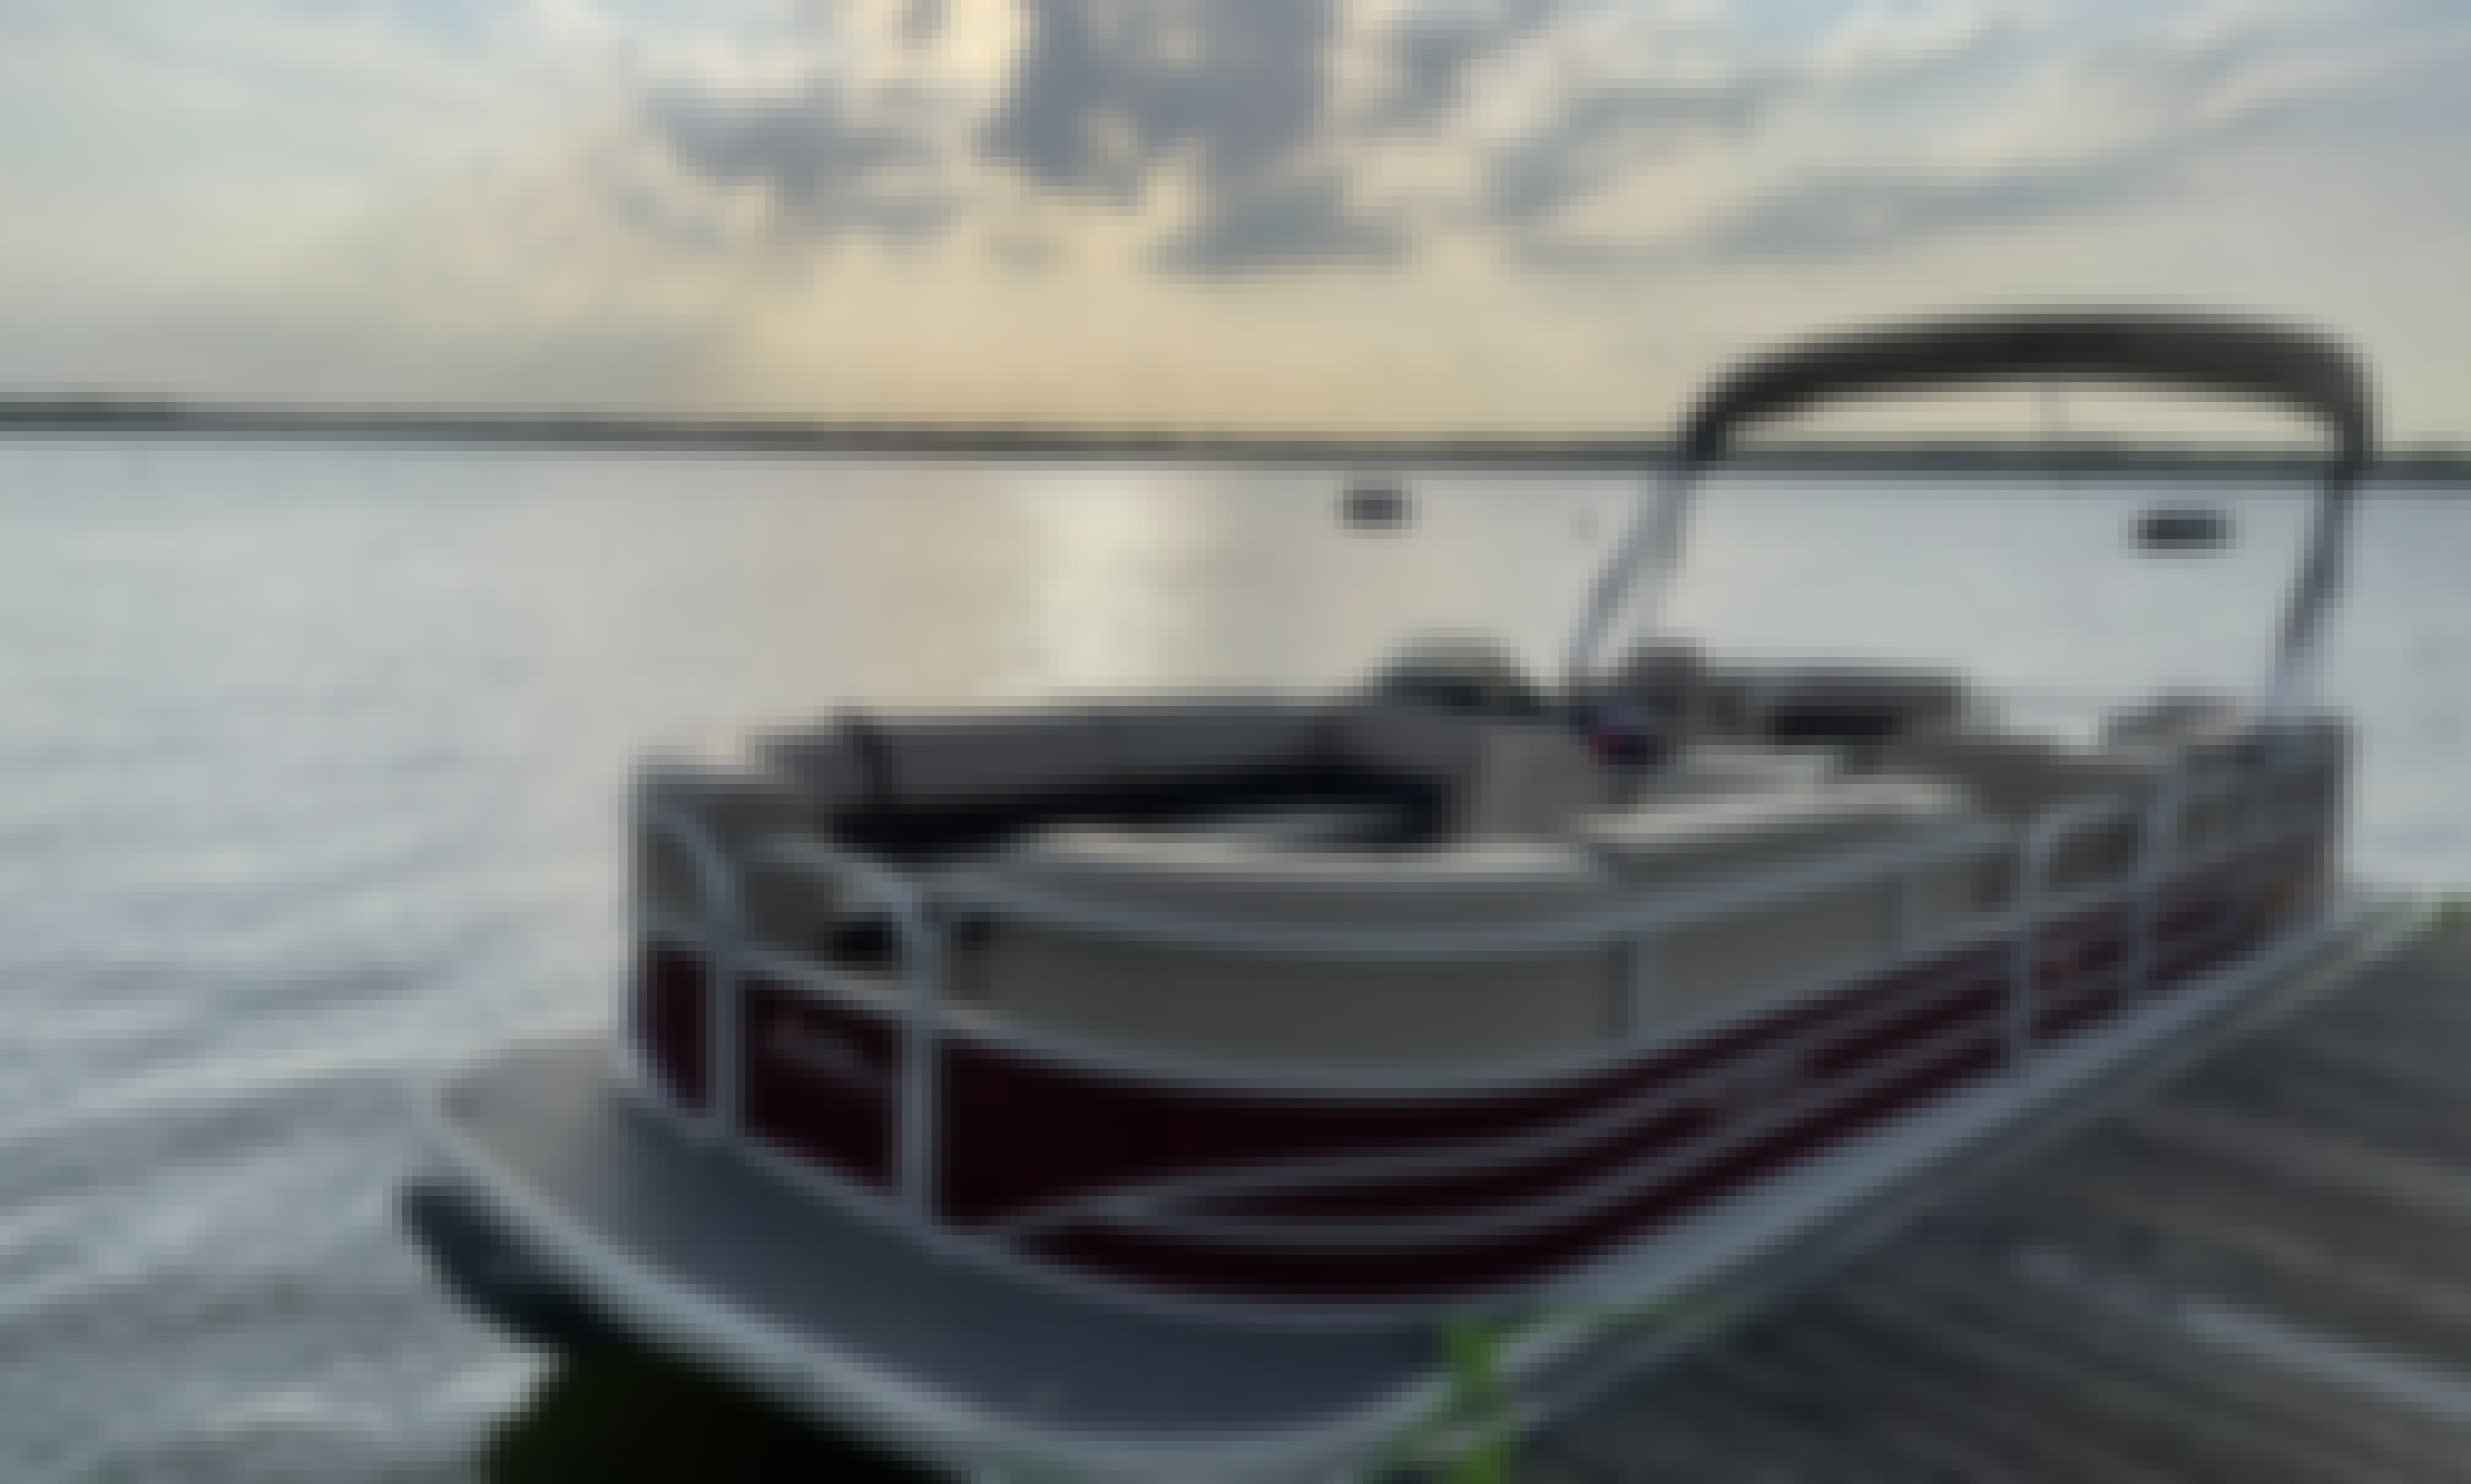 Sun Tracker 24' Pontoon Boat for Rent on Lake Tawakoni